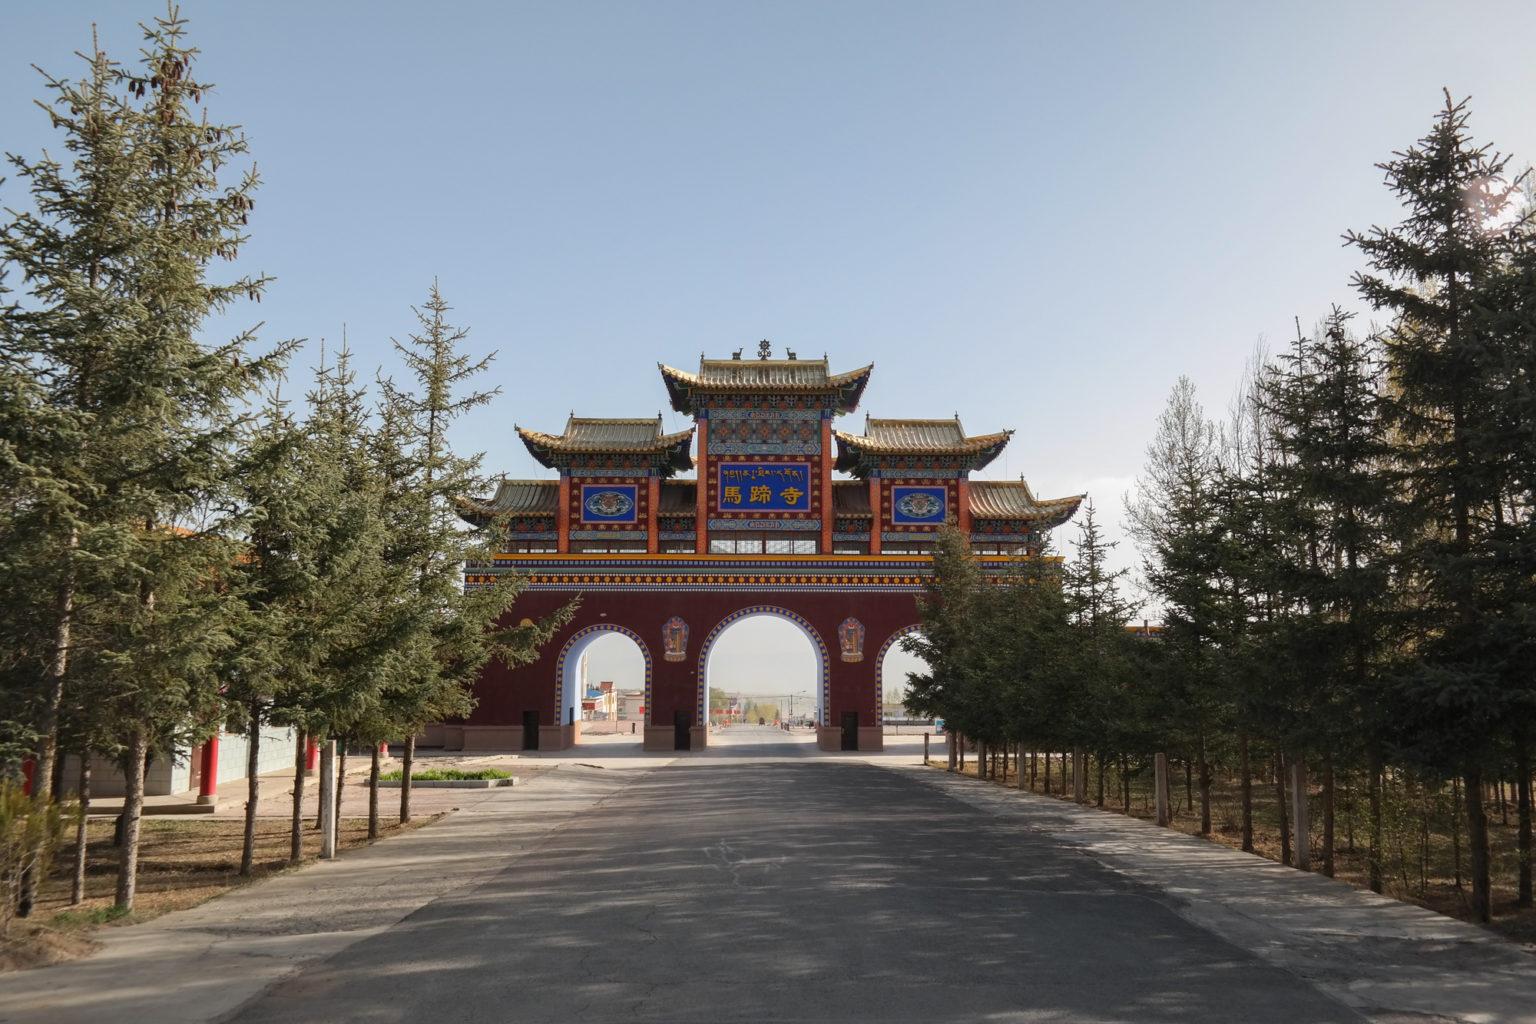 Mati Si Entrance Gate